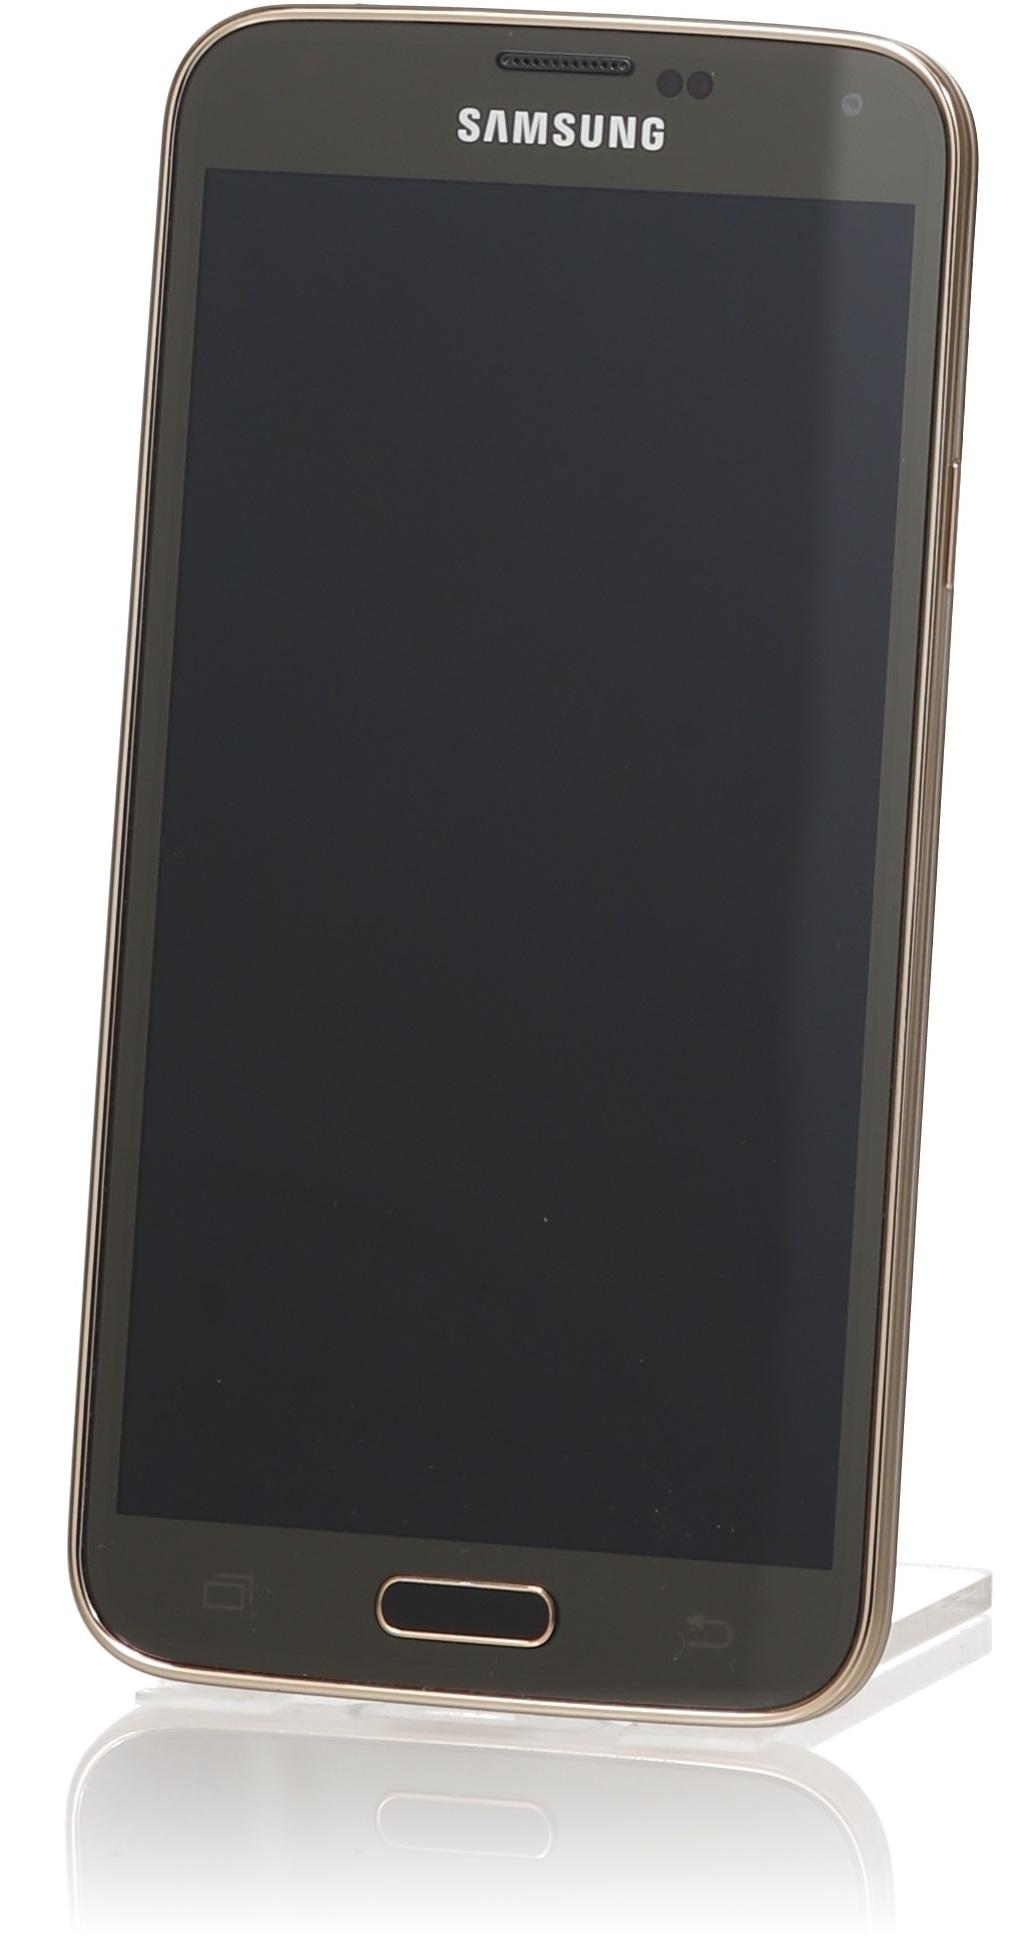 Samsung G900F Galaxy S5 16GB copper gold